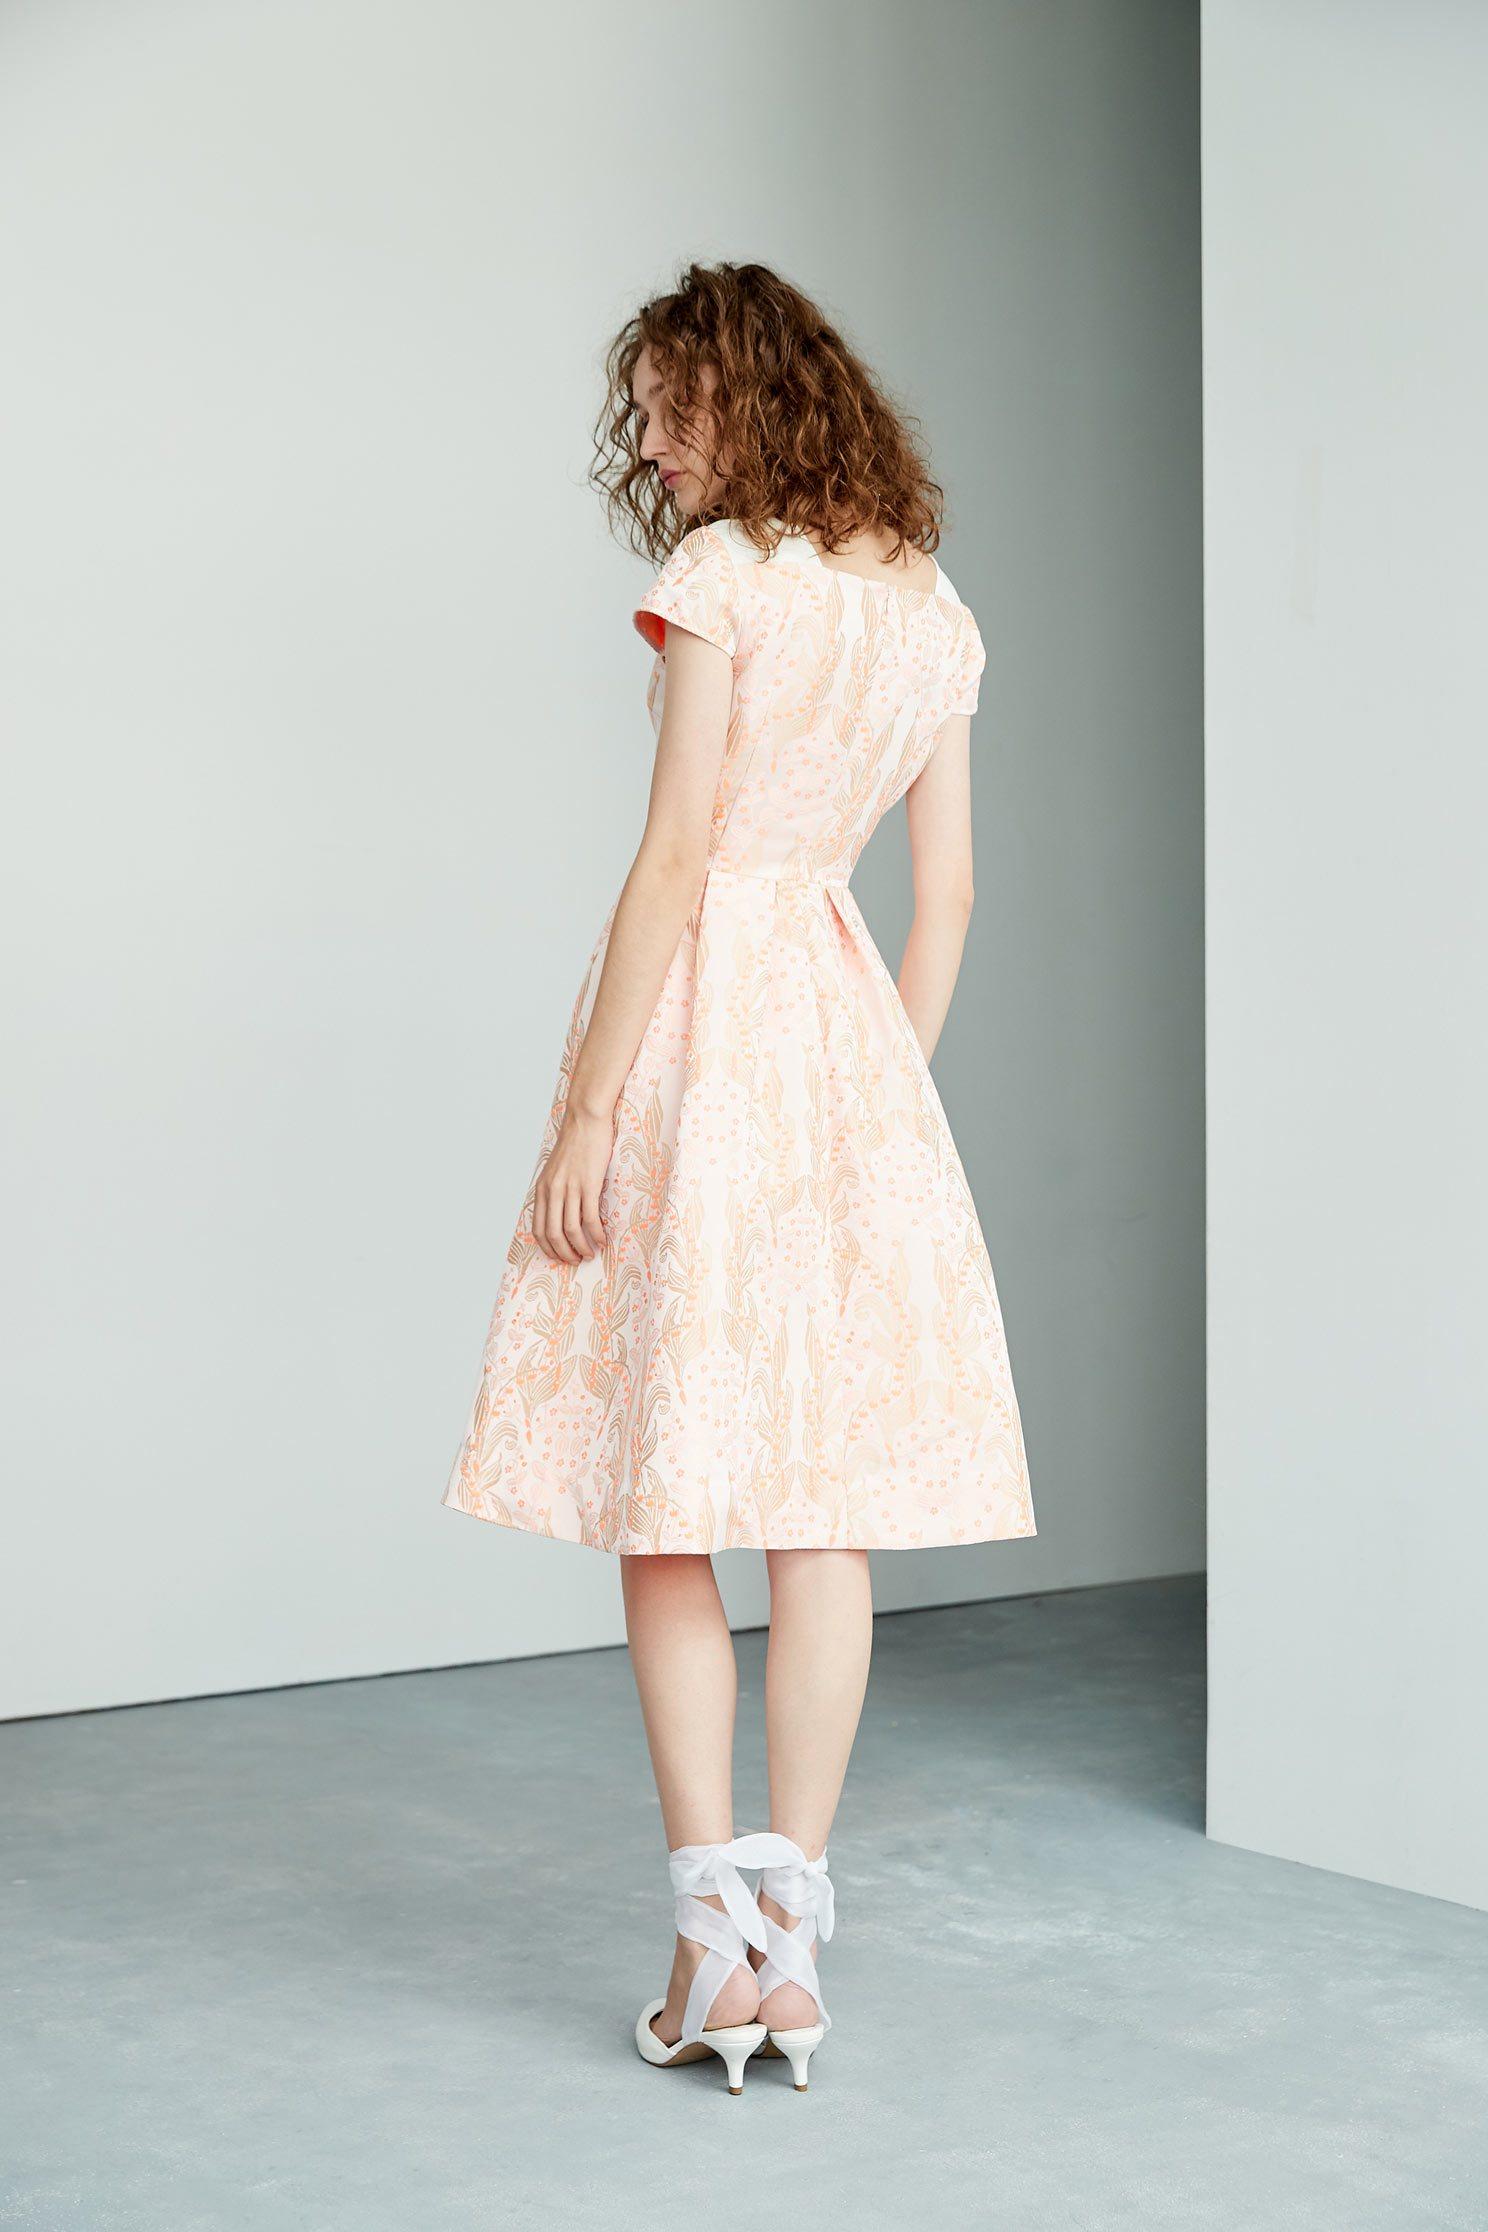 Vintage floral dress,shortsleevedress,onepiecedress